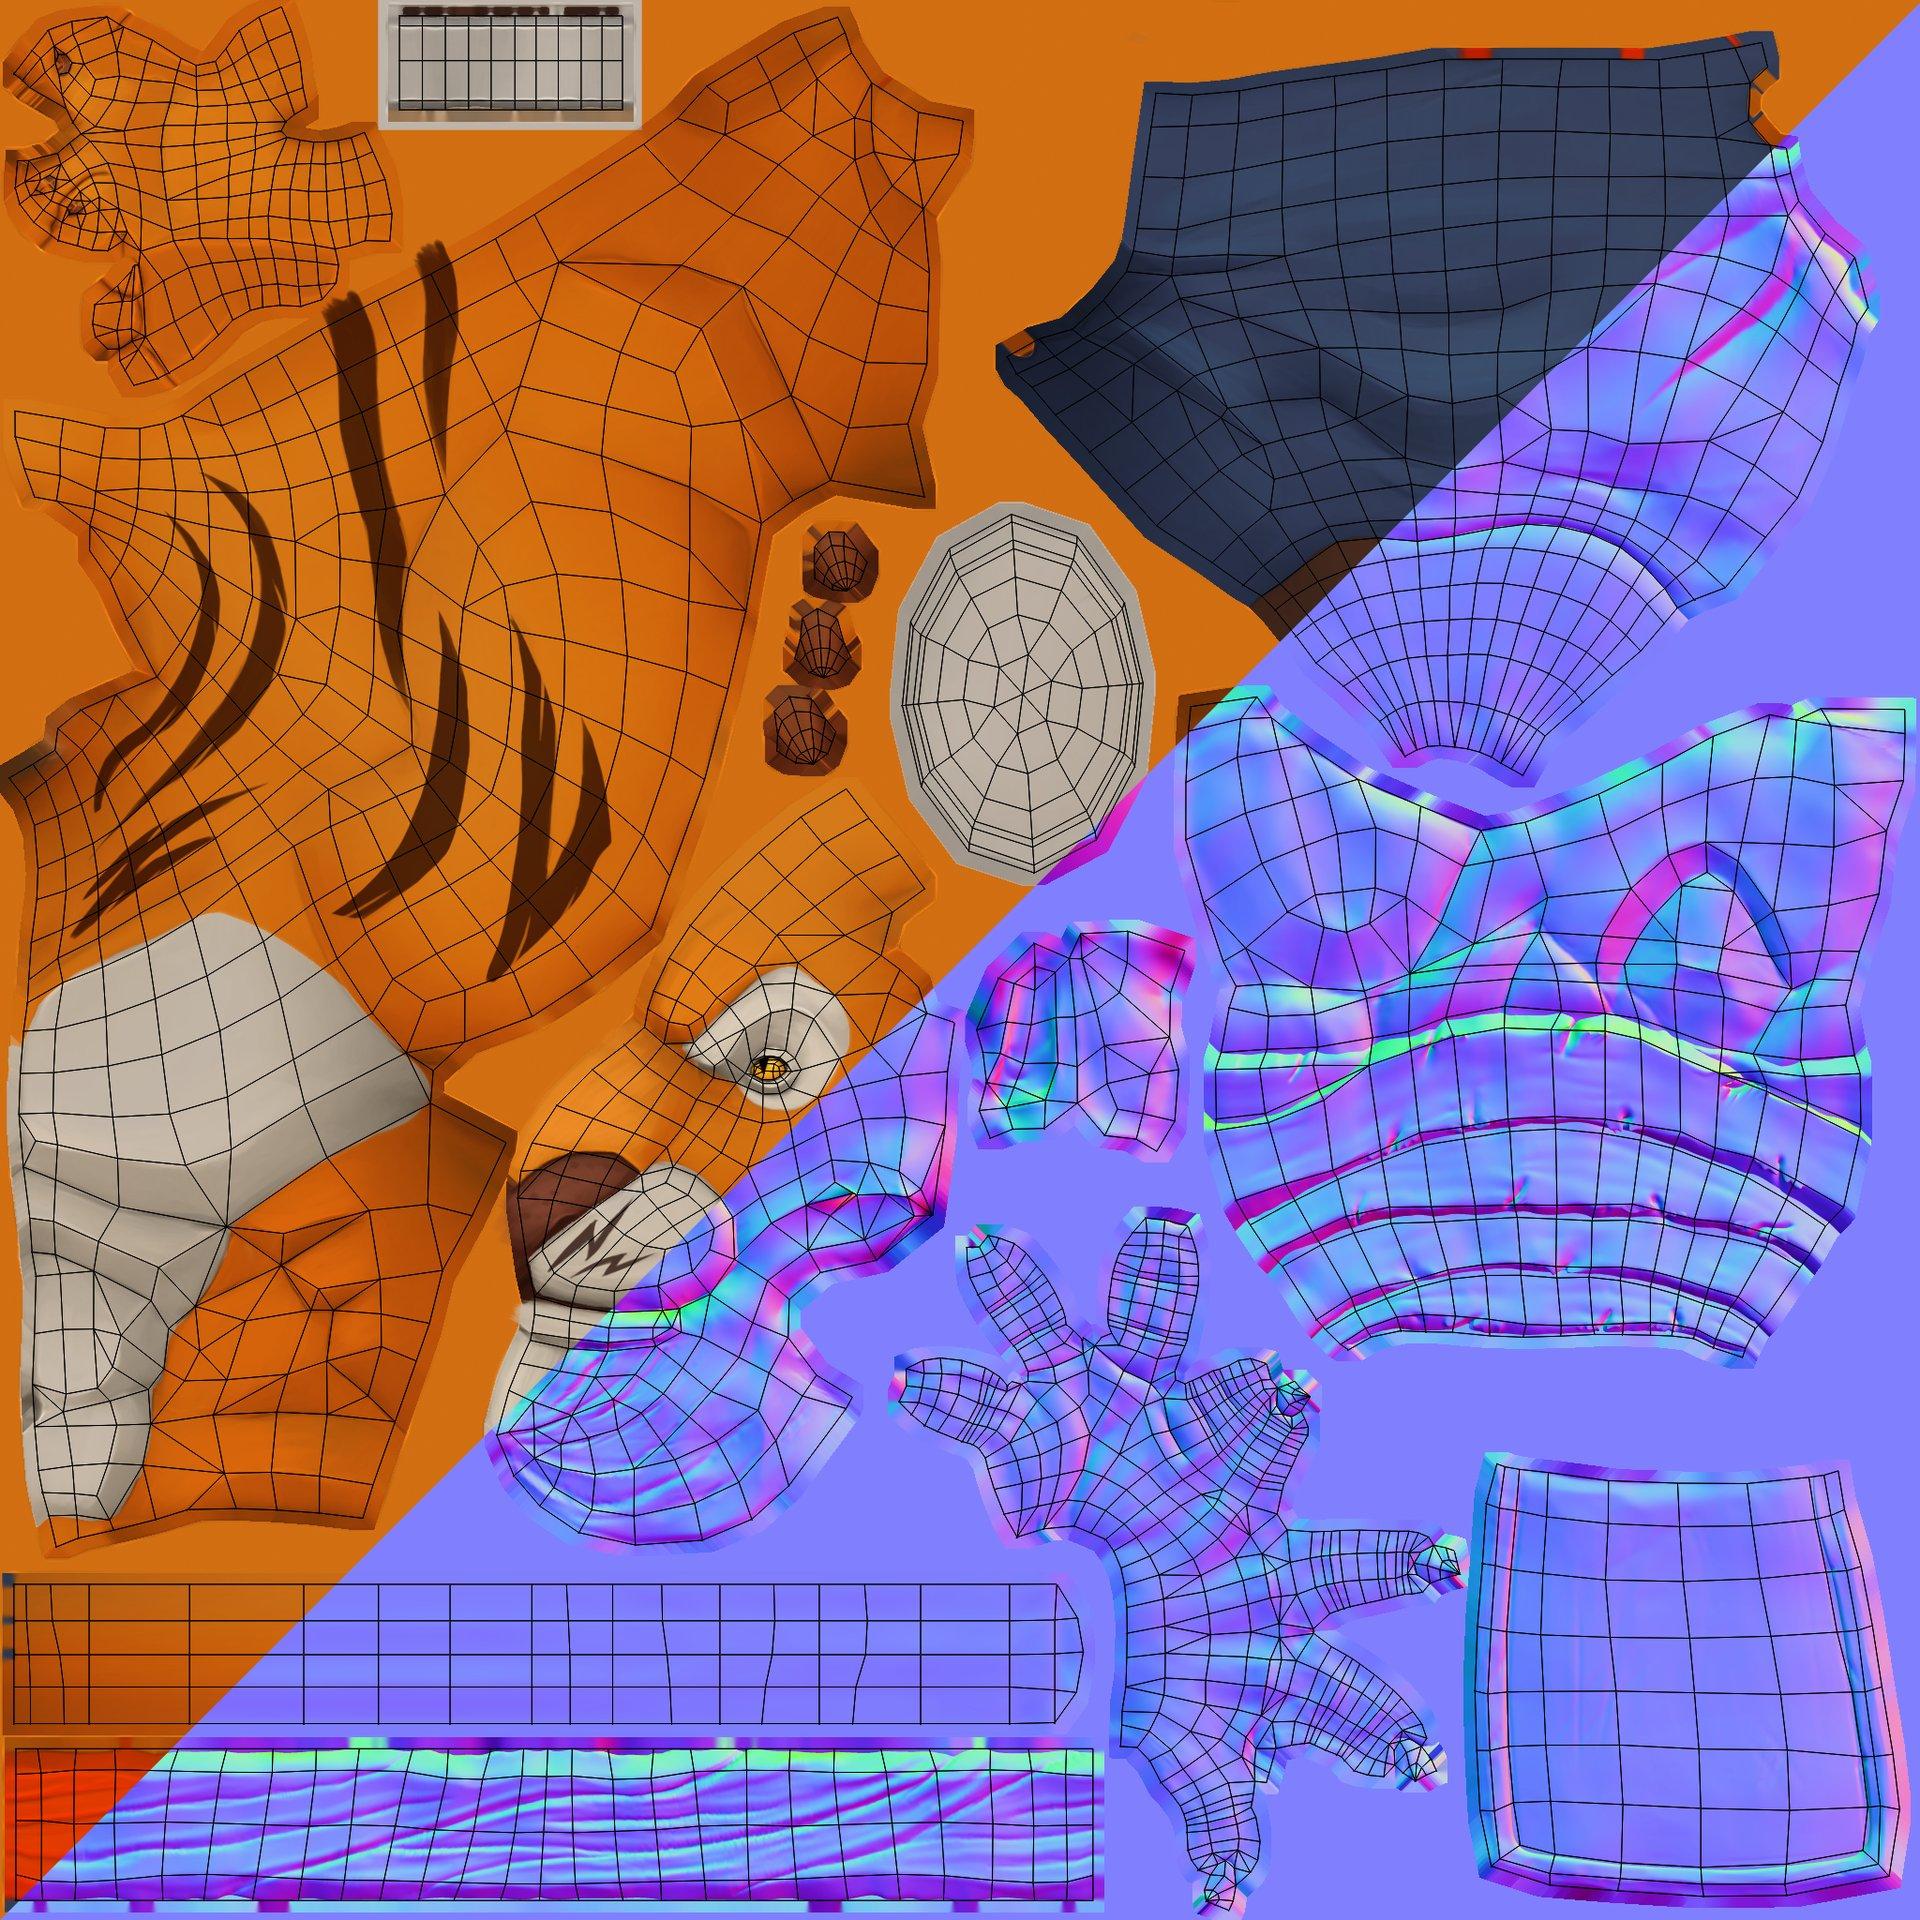 Giles ruscoe lu tiger textures